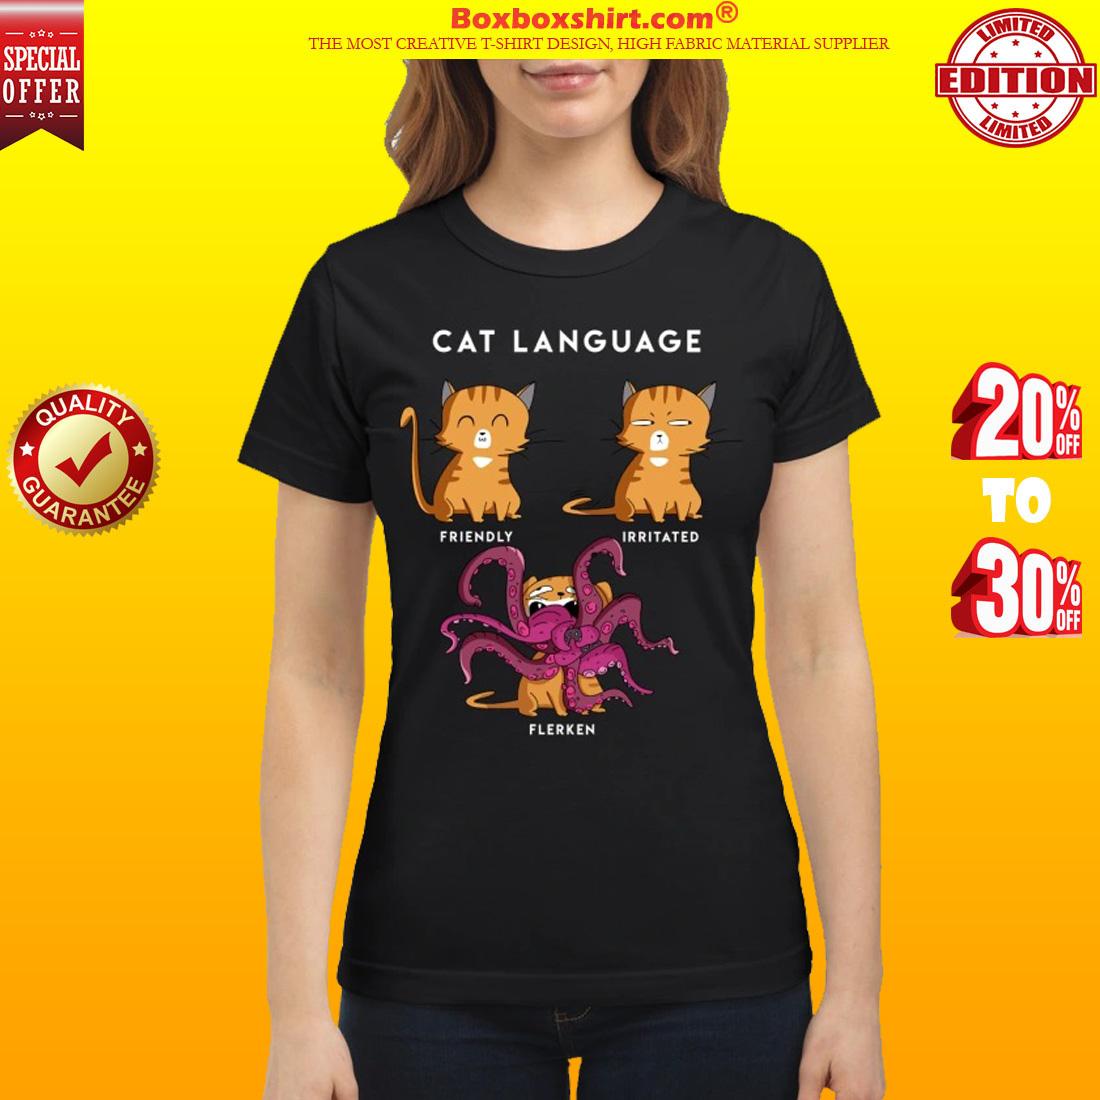 Cat language friendly irrtated flerken shirt